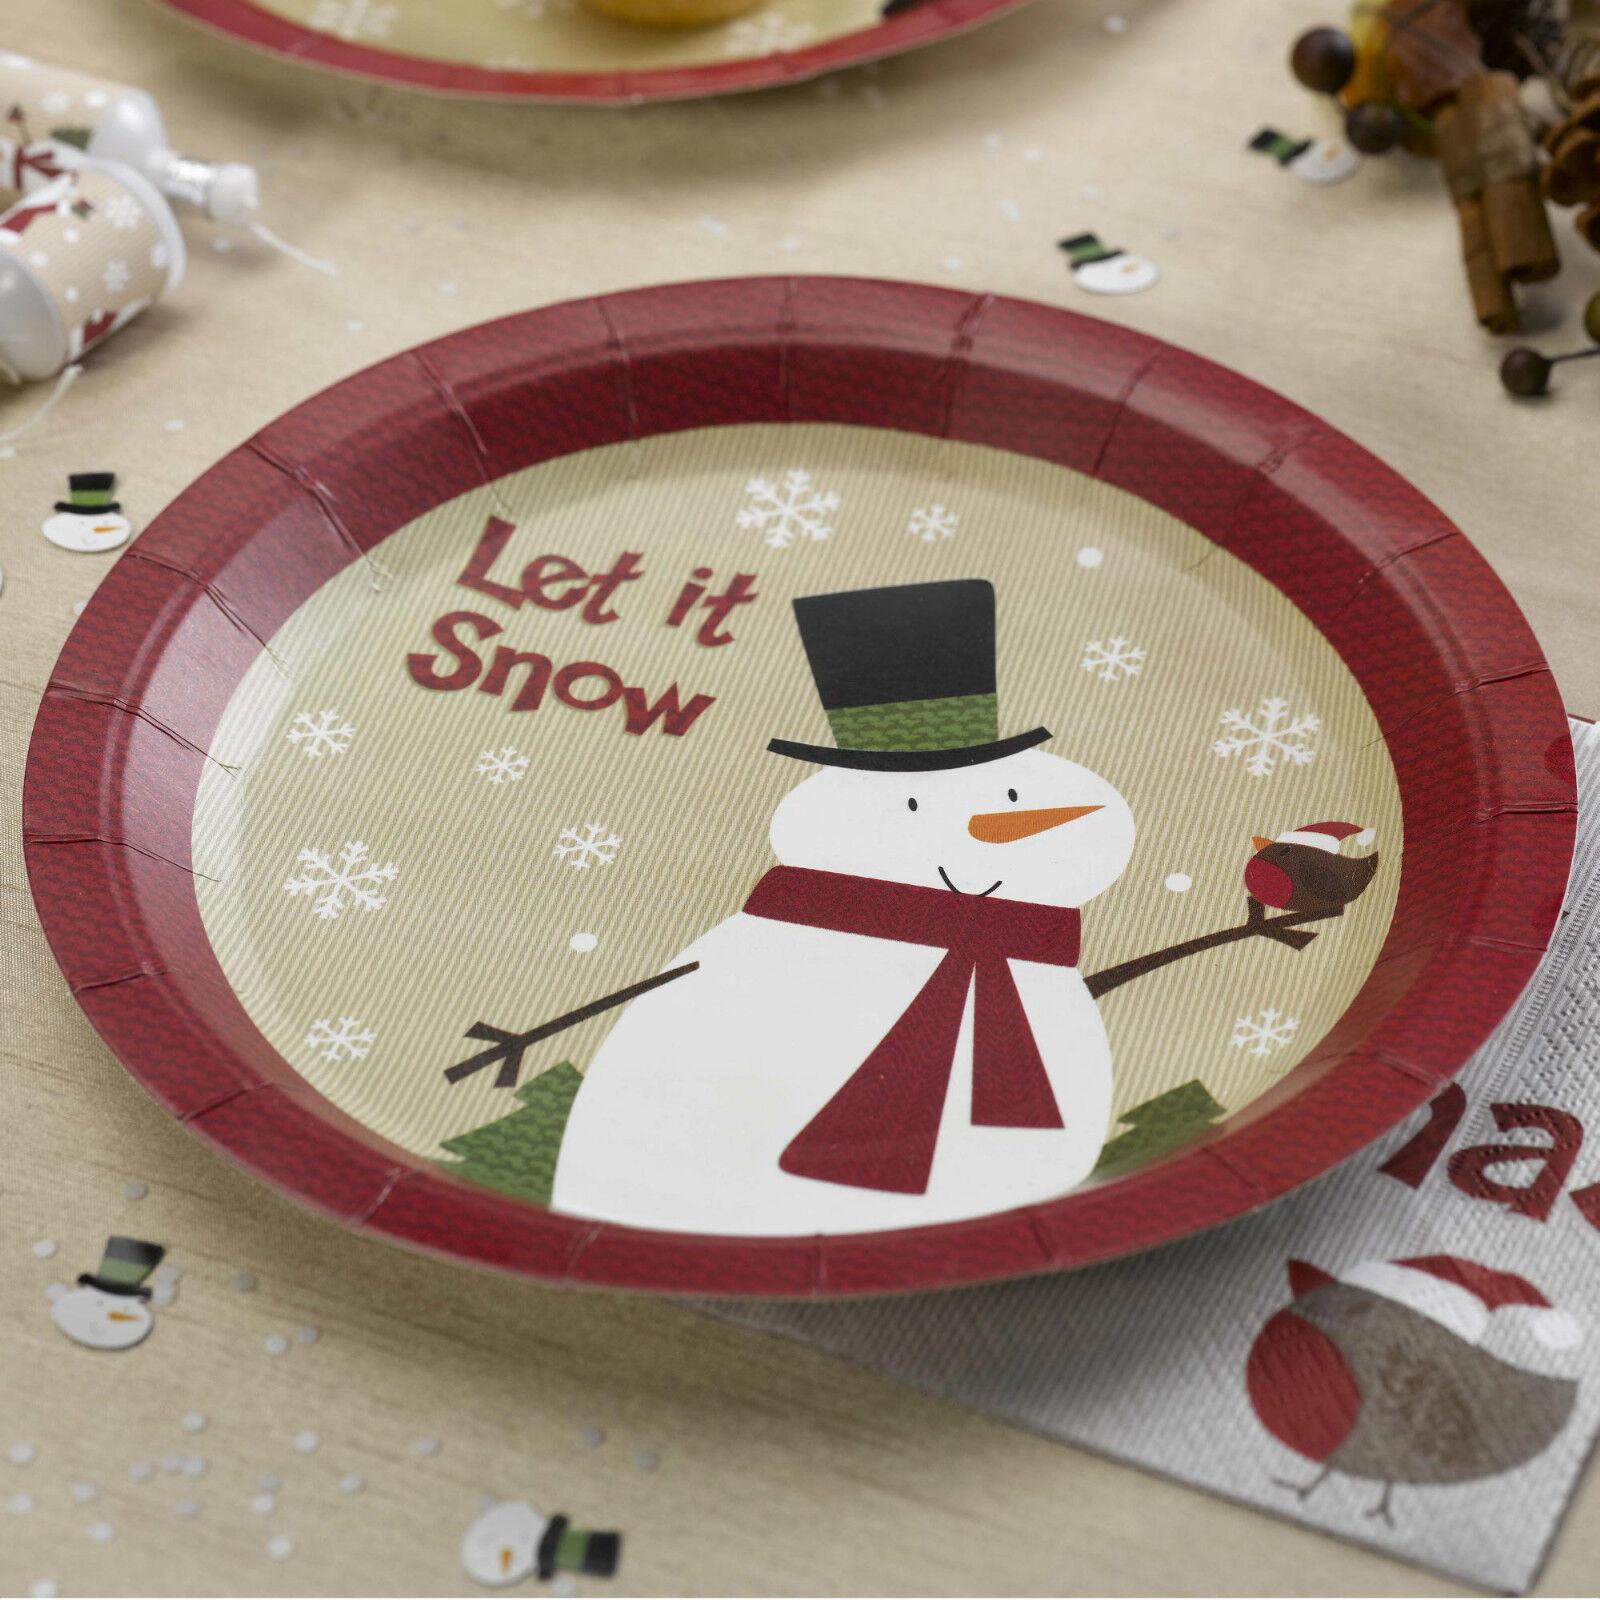 Picture 1 of 1 & 8 Let It Snow Snowman Christmas Paper Plates Xmas Tableware Festive ...